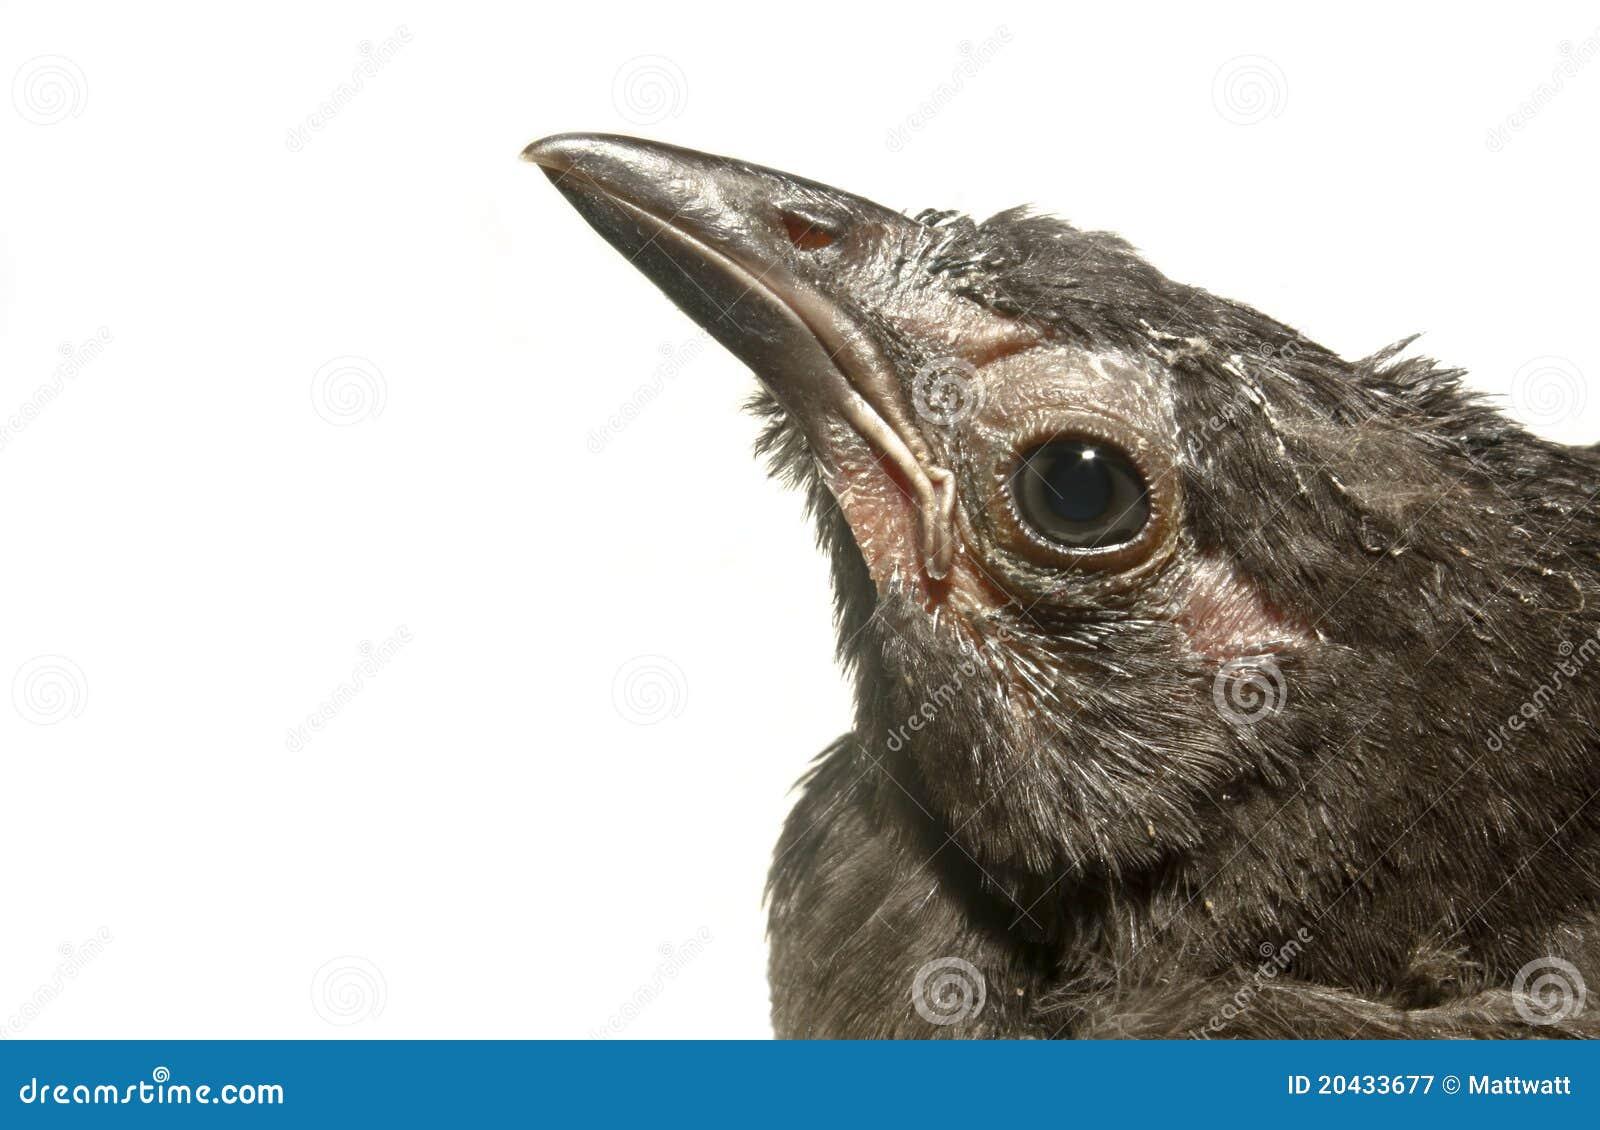 fledgling grackle - photo #15